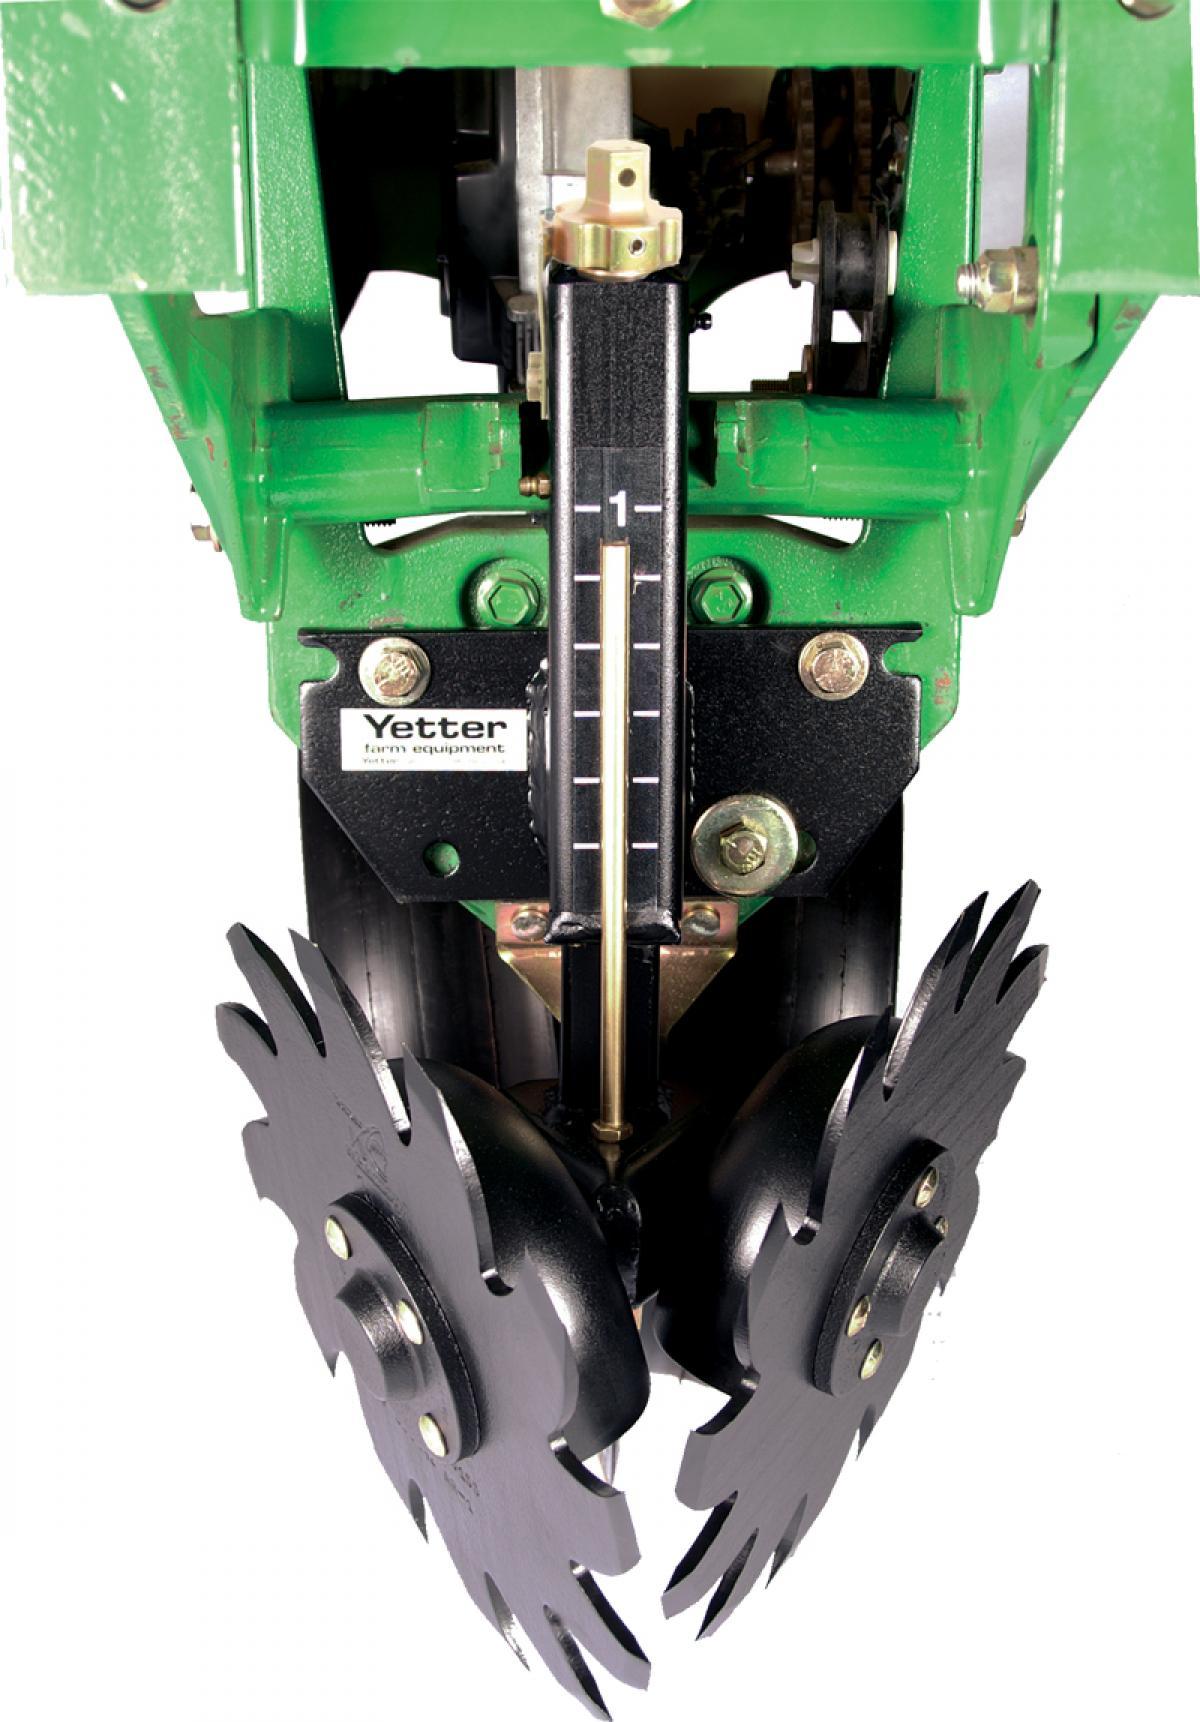 Yetter 2967 Screw Adjust Residue Mangers For John Deere or Kinze Planters